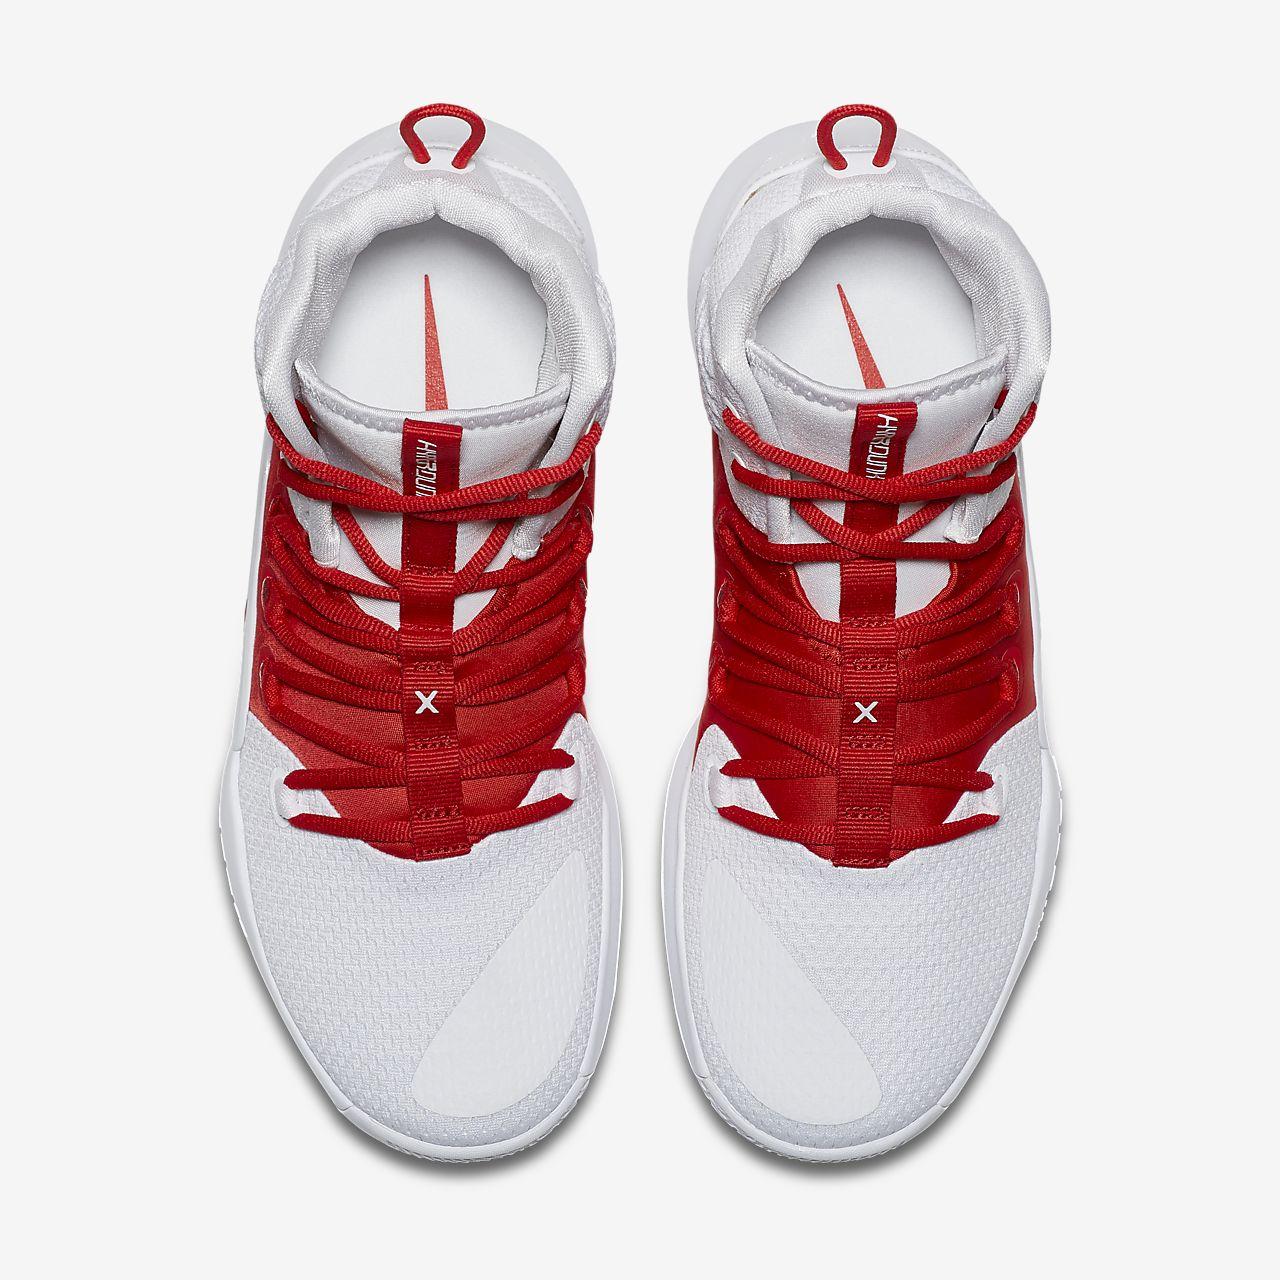 newest eb1b2 3d3c8 ... Nike Hyperdunk X (Team) Basketball Shoe